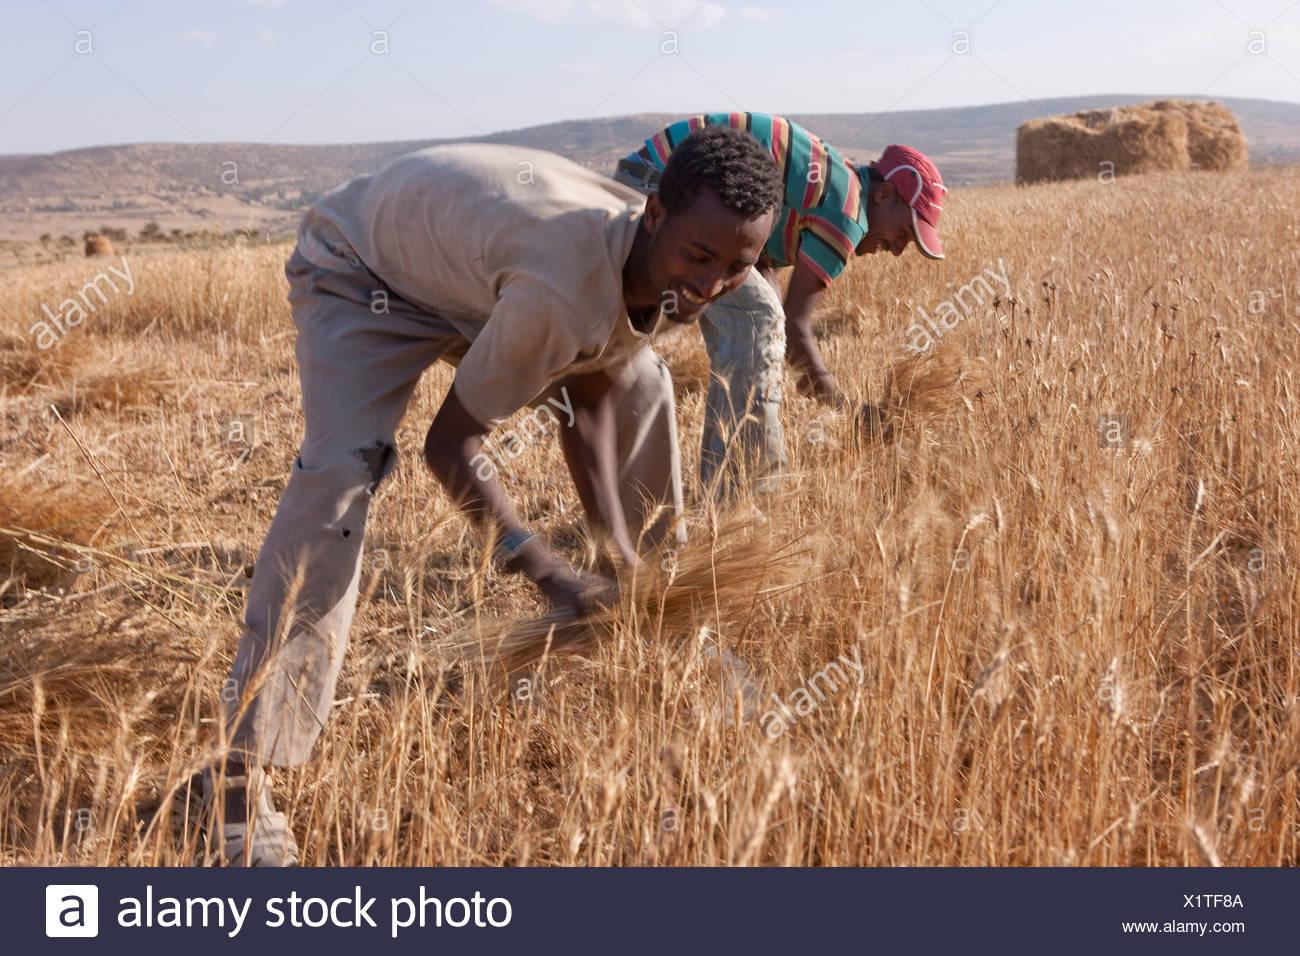 Grain harvest, harvest, crop, Abyssinia highlands, highland, Africa, scenery, landscape, agriculture, farmers, Ethiopia, - Stock Image